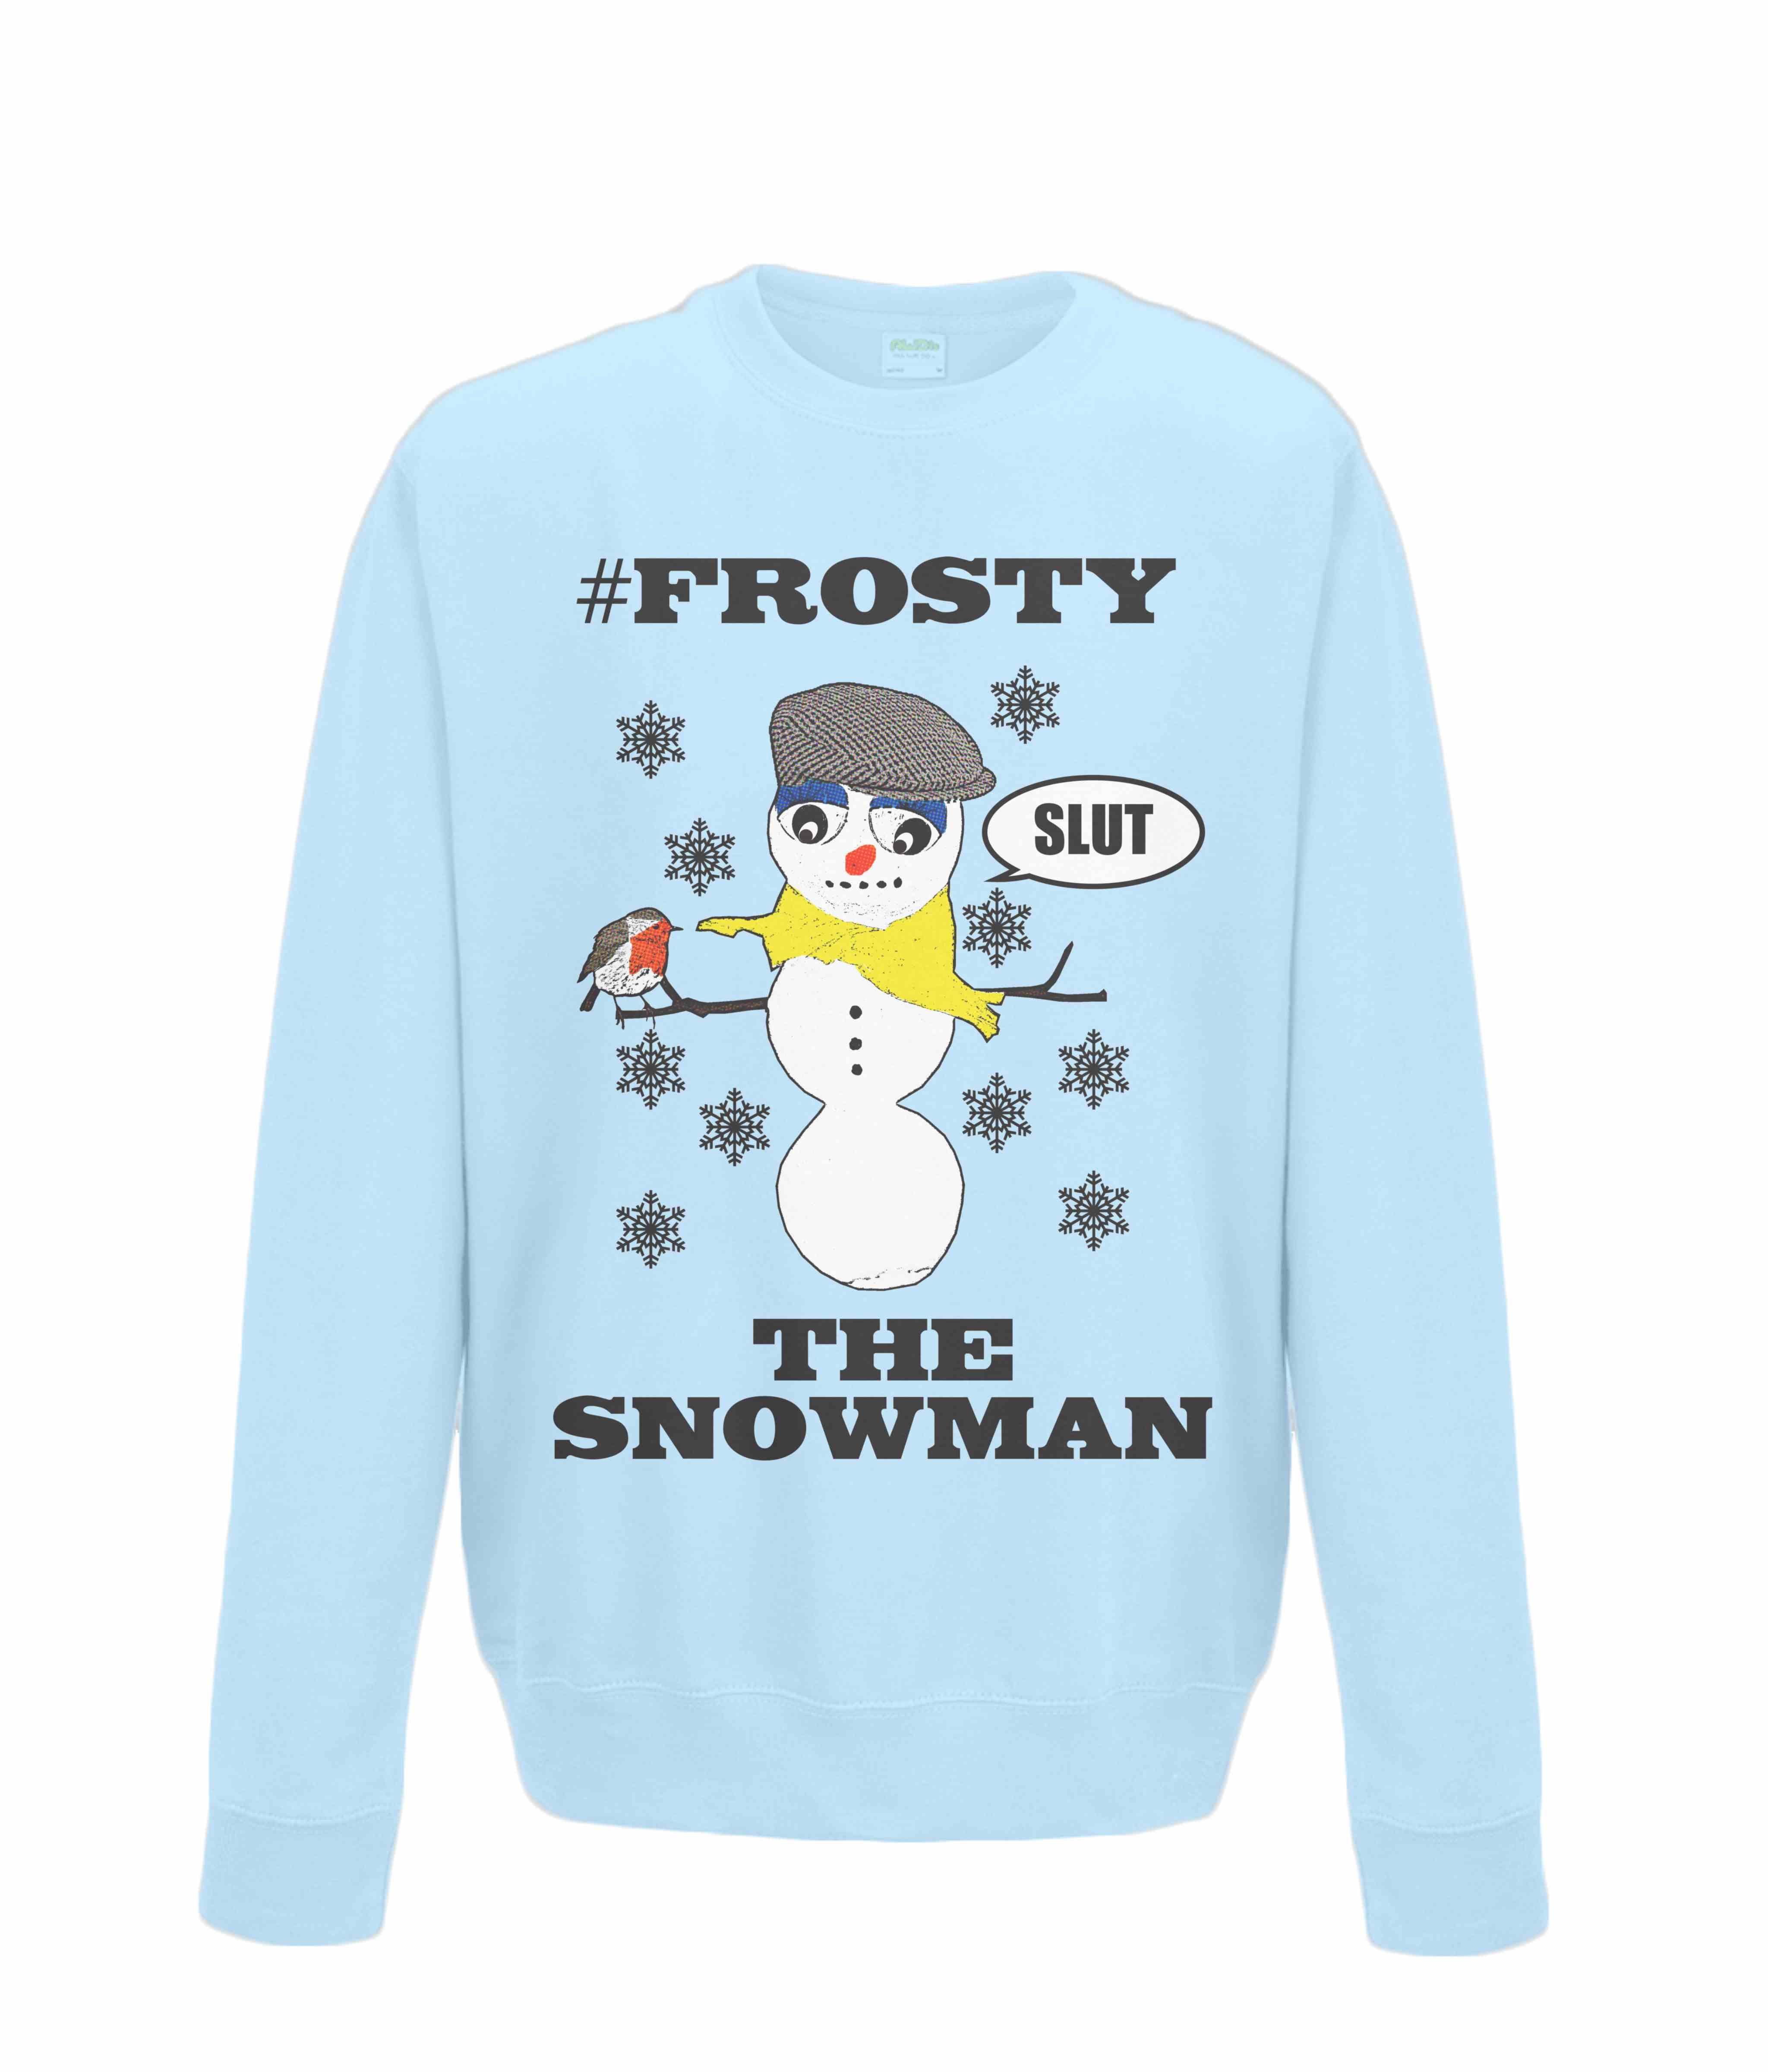 b99b41f5b7 #Frosty The Snowman! Rude, Funny Christmas Jumper! #fashion #style #humour # christmas #christmas song #frostythesnowman #robinredbreast #rude ...